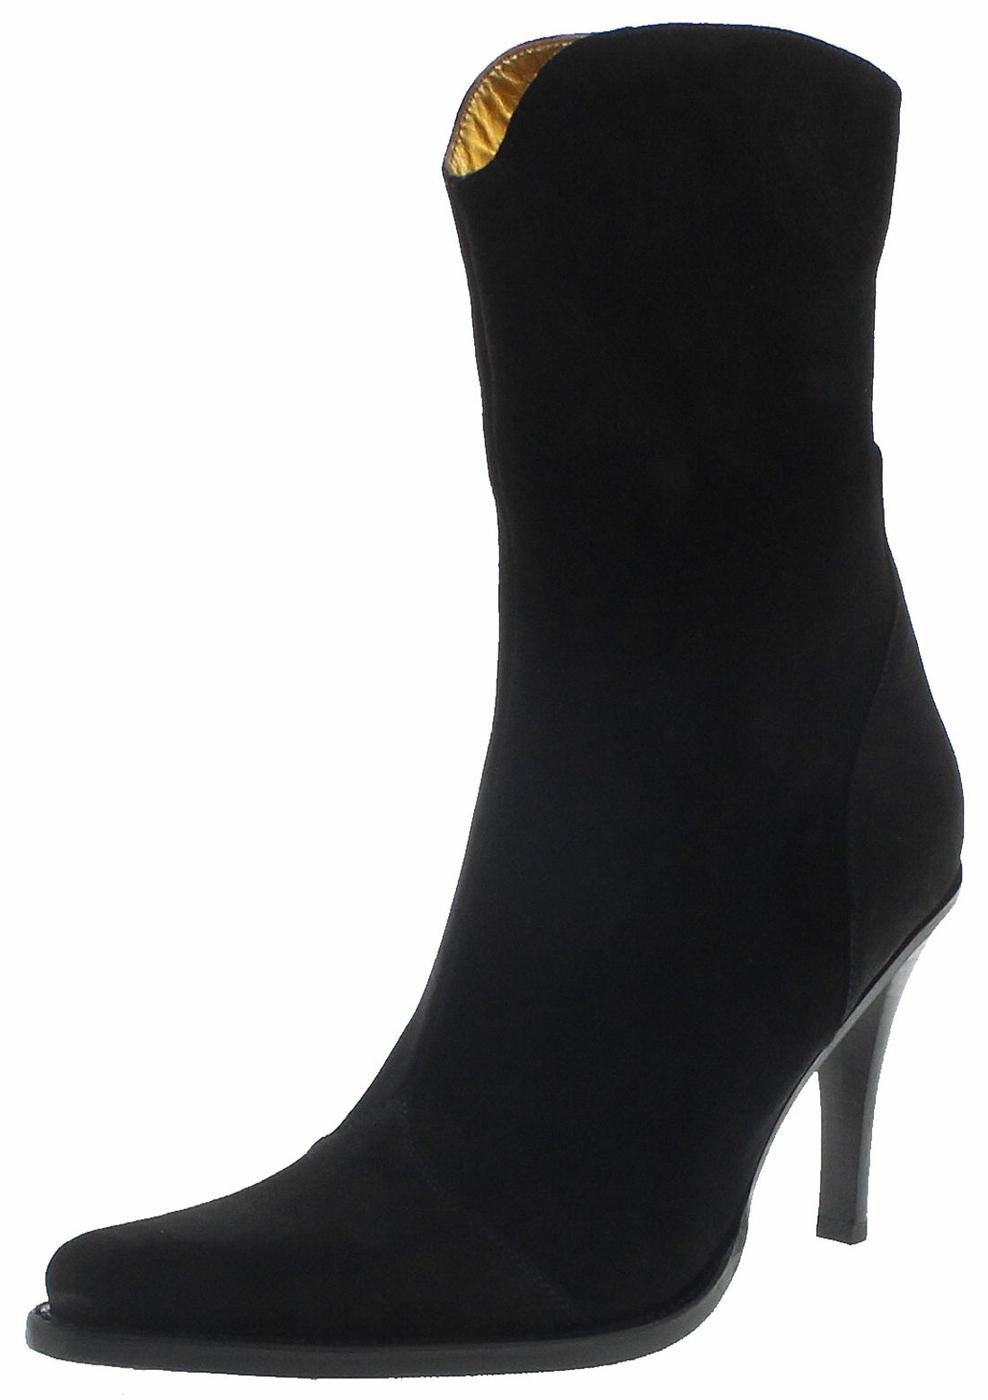 FB Fashion Boots BRAVO Serraje Negro Ladies Stiletto - black